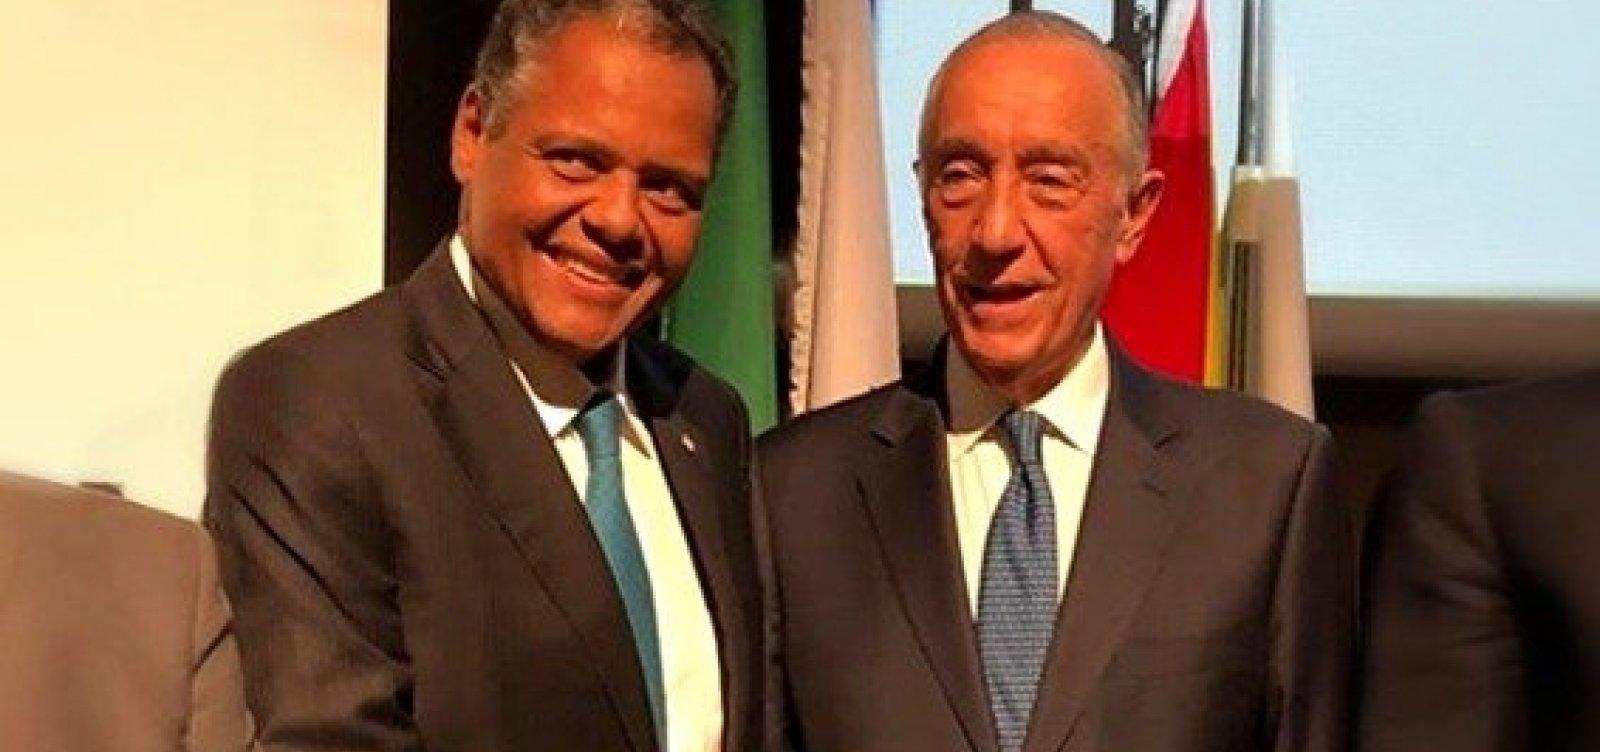 [Antônio Brito e presidente de Portugal dialogam sobre as Santas Casas]